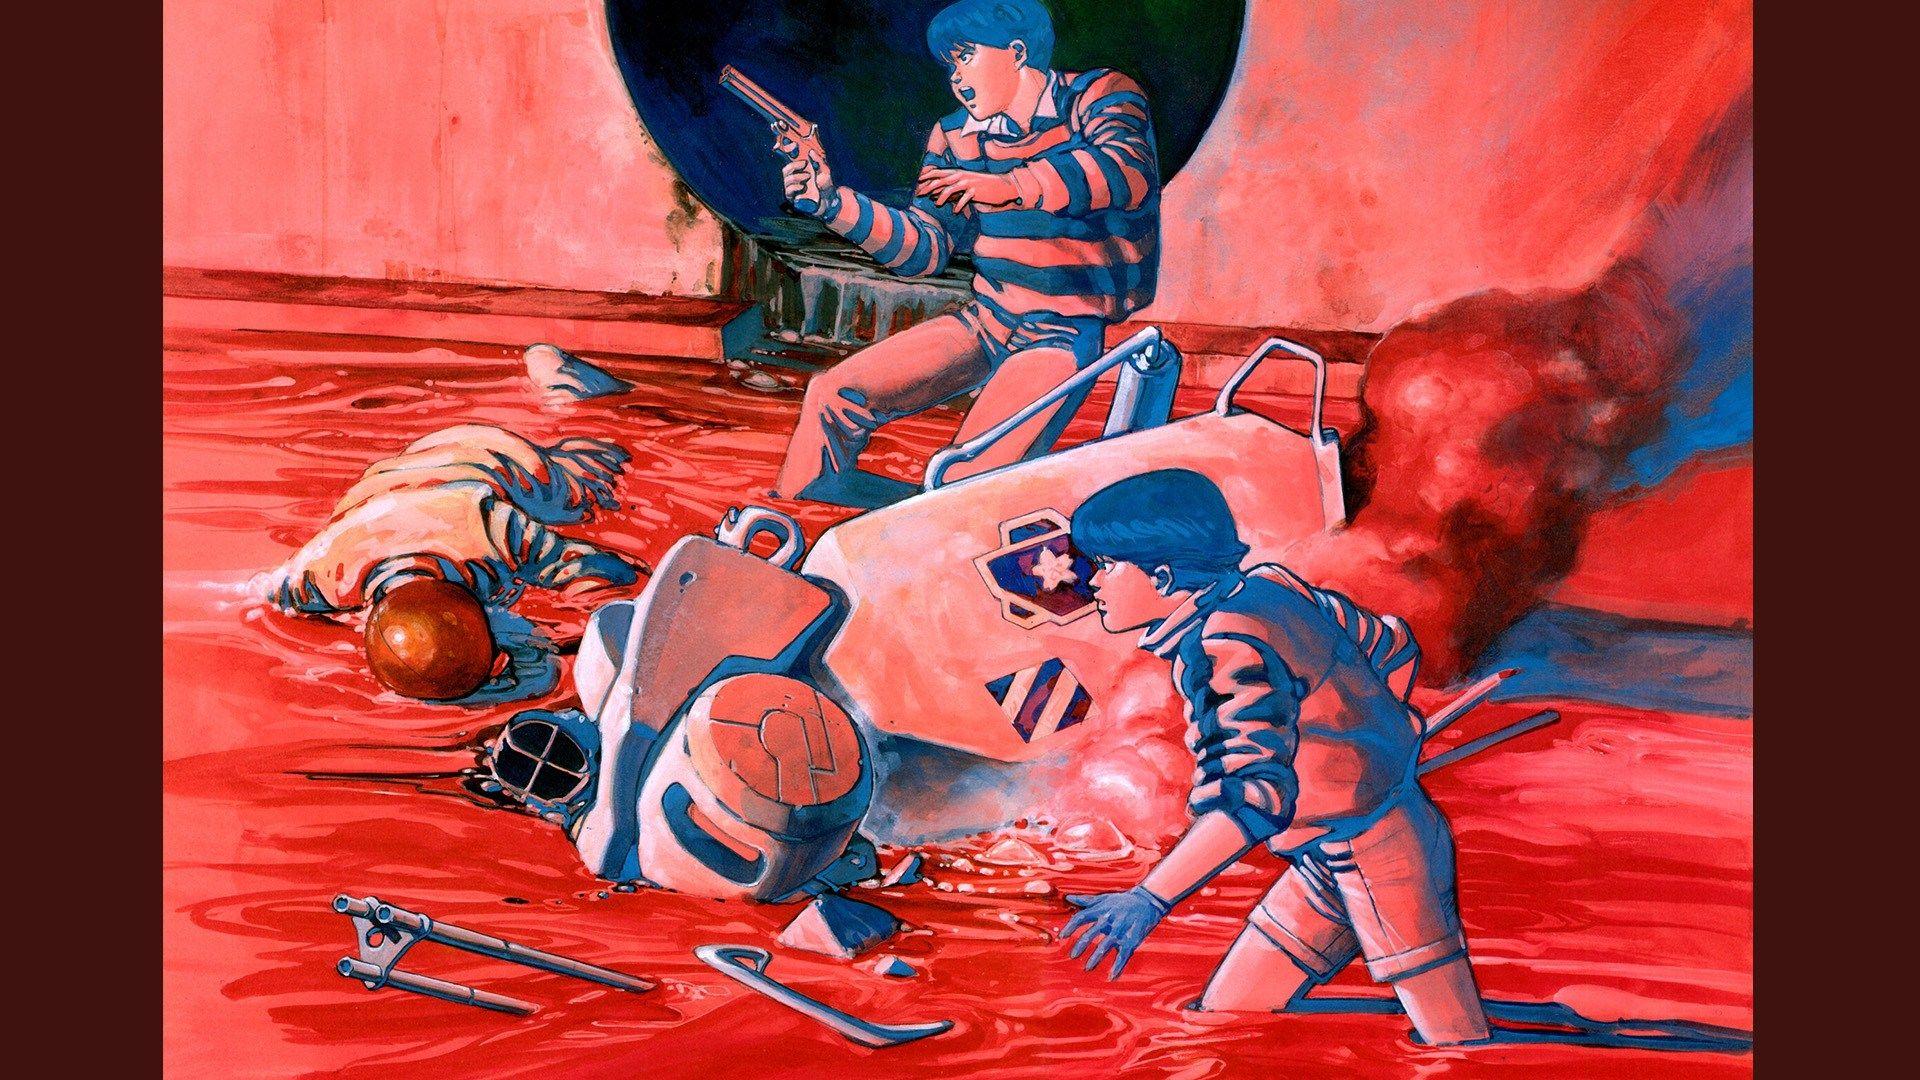 厳選壁紙 Mac Pc 壁紙 97 Akira アキラ 枚 Applejp Macjp In Akira Manga Akira Canvas Prints